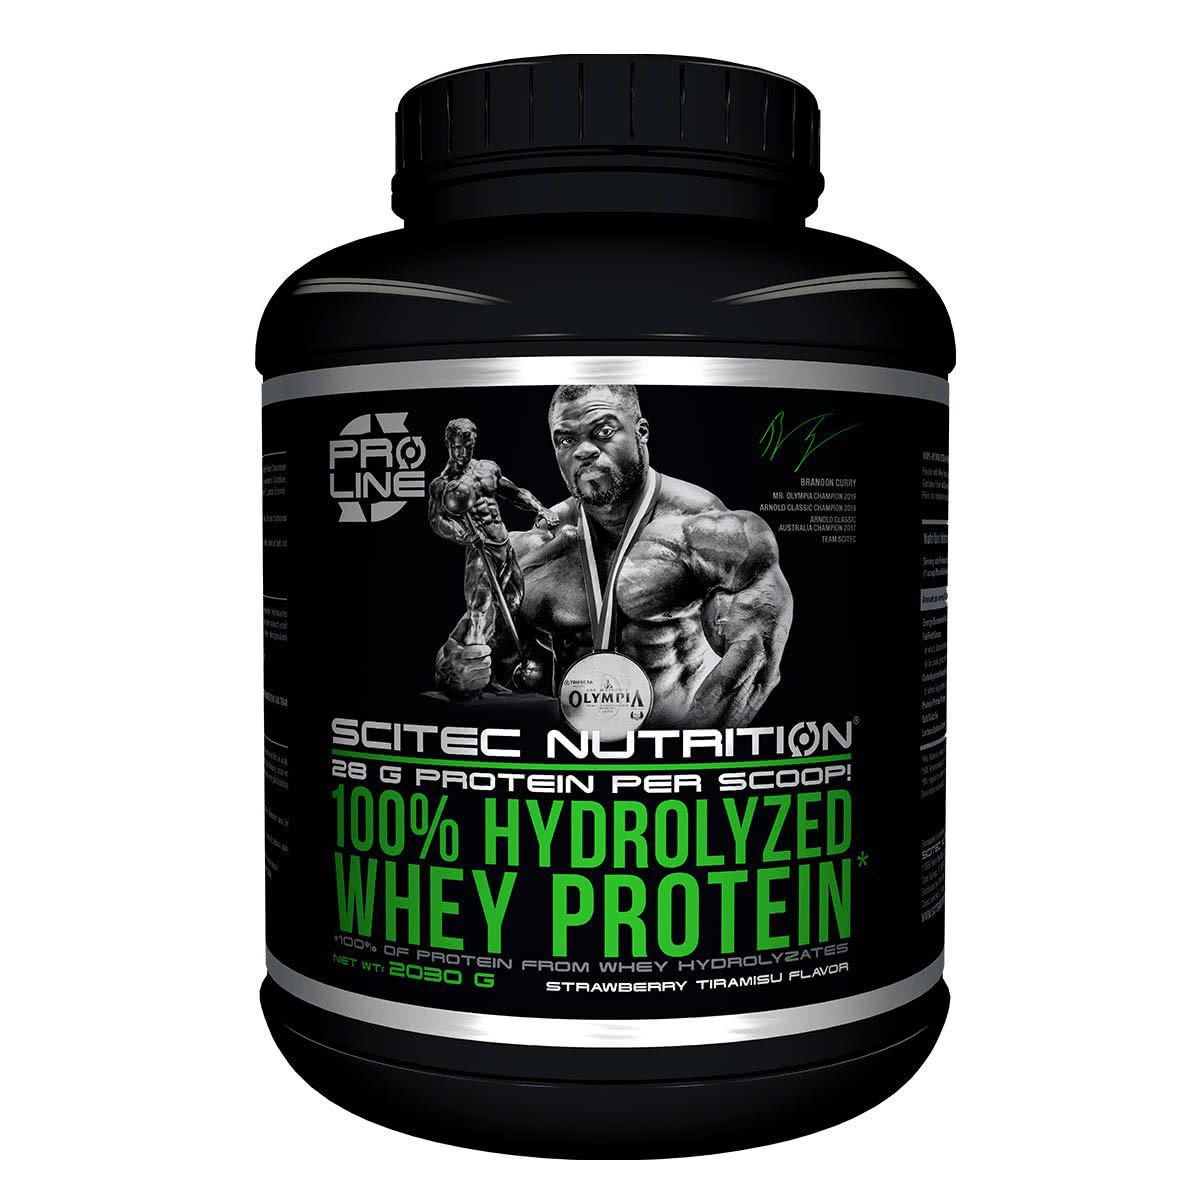 Scitec Nutrition 100% Hydrolyzed Whey Protein 2,03 kg